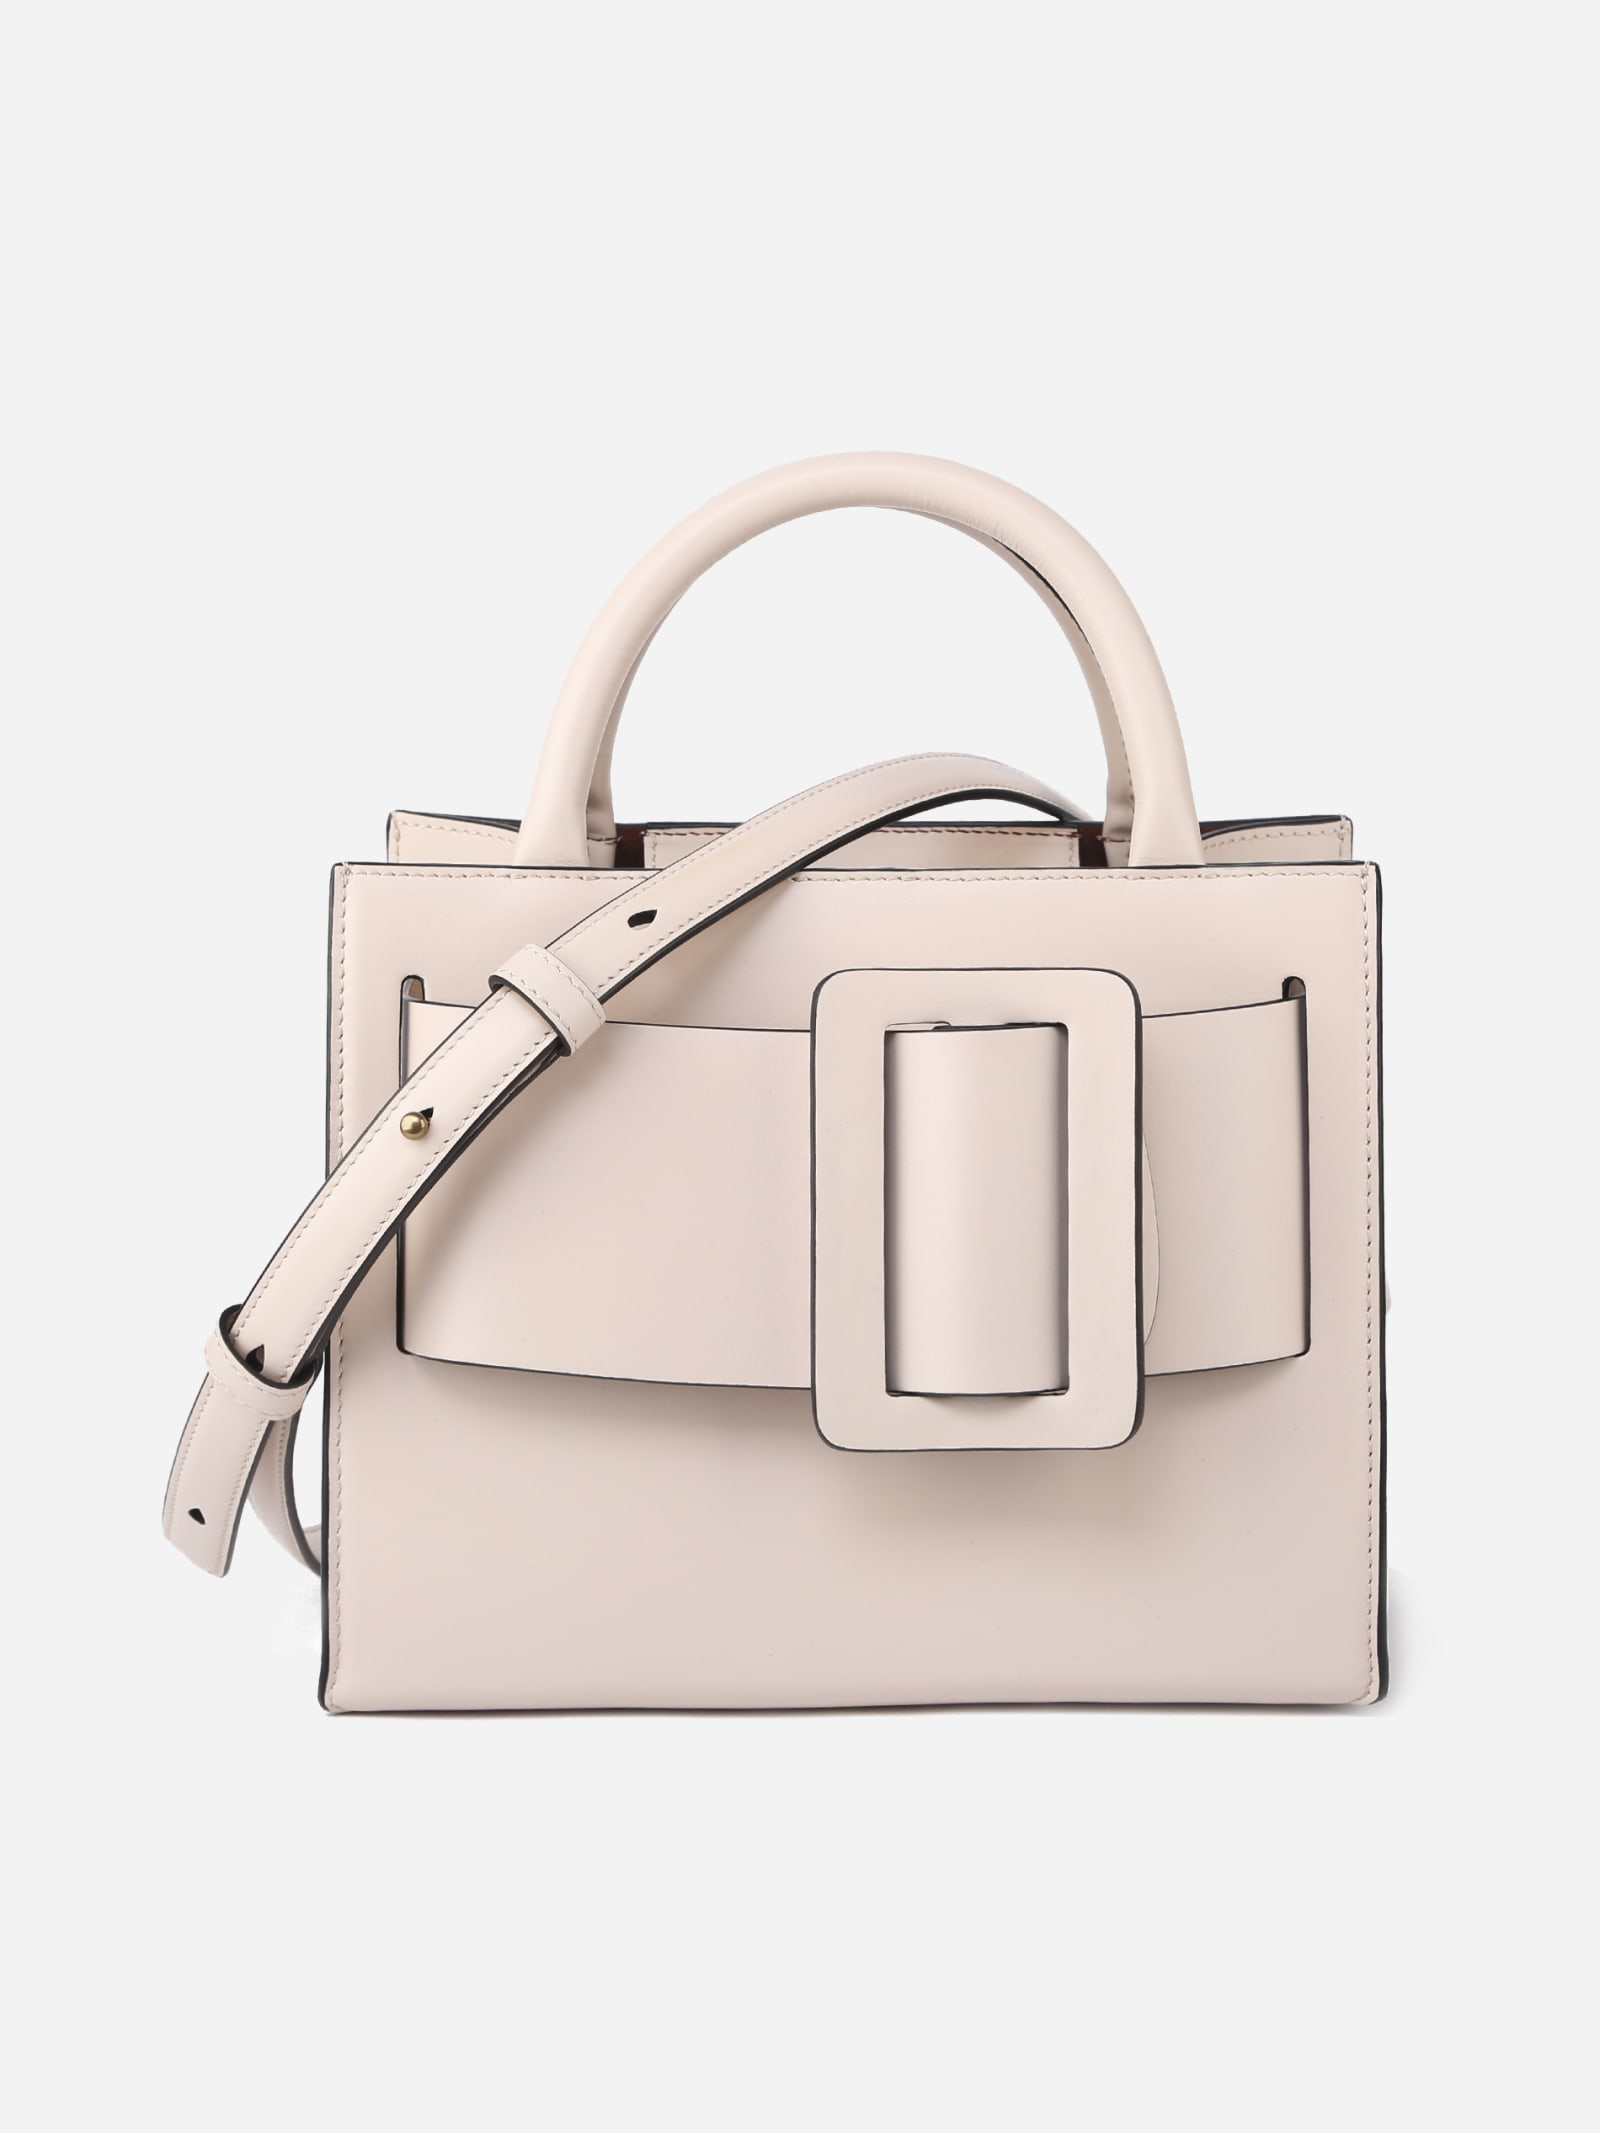 Bobby 23 Leather Handbag